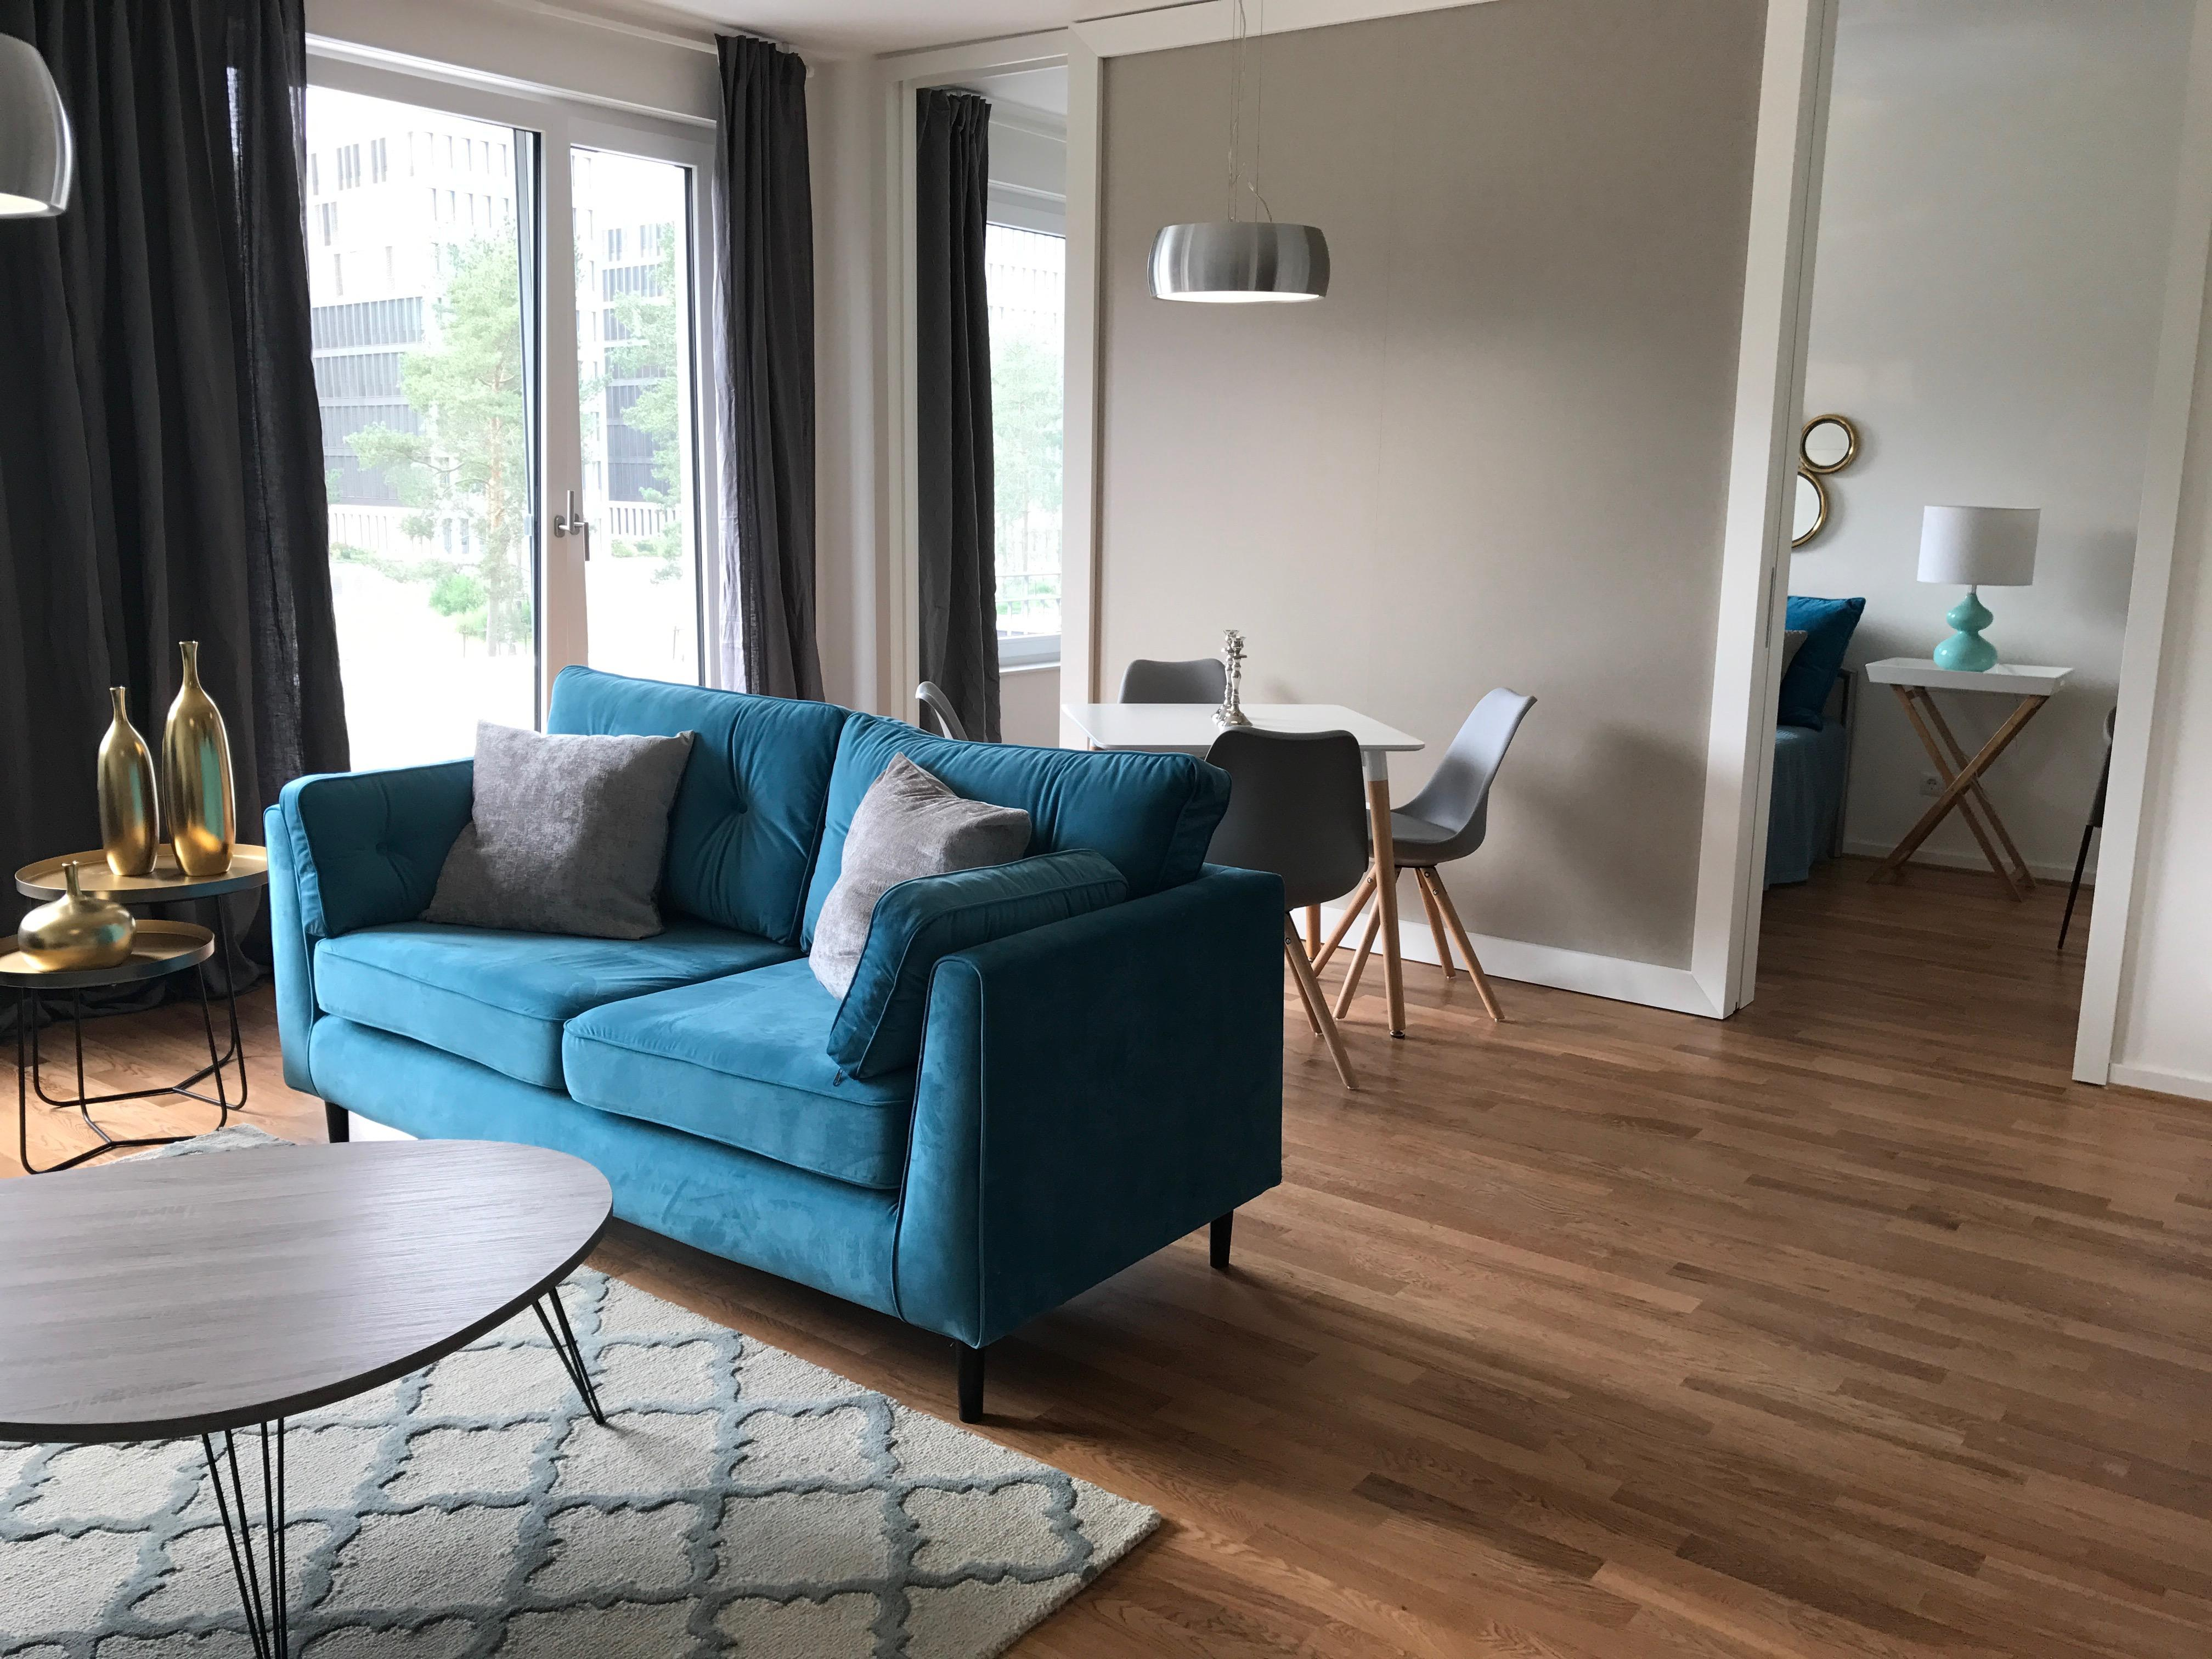 Wohnzimmer Blau Sofa CMiracle Room